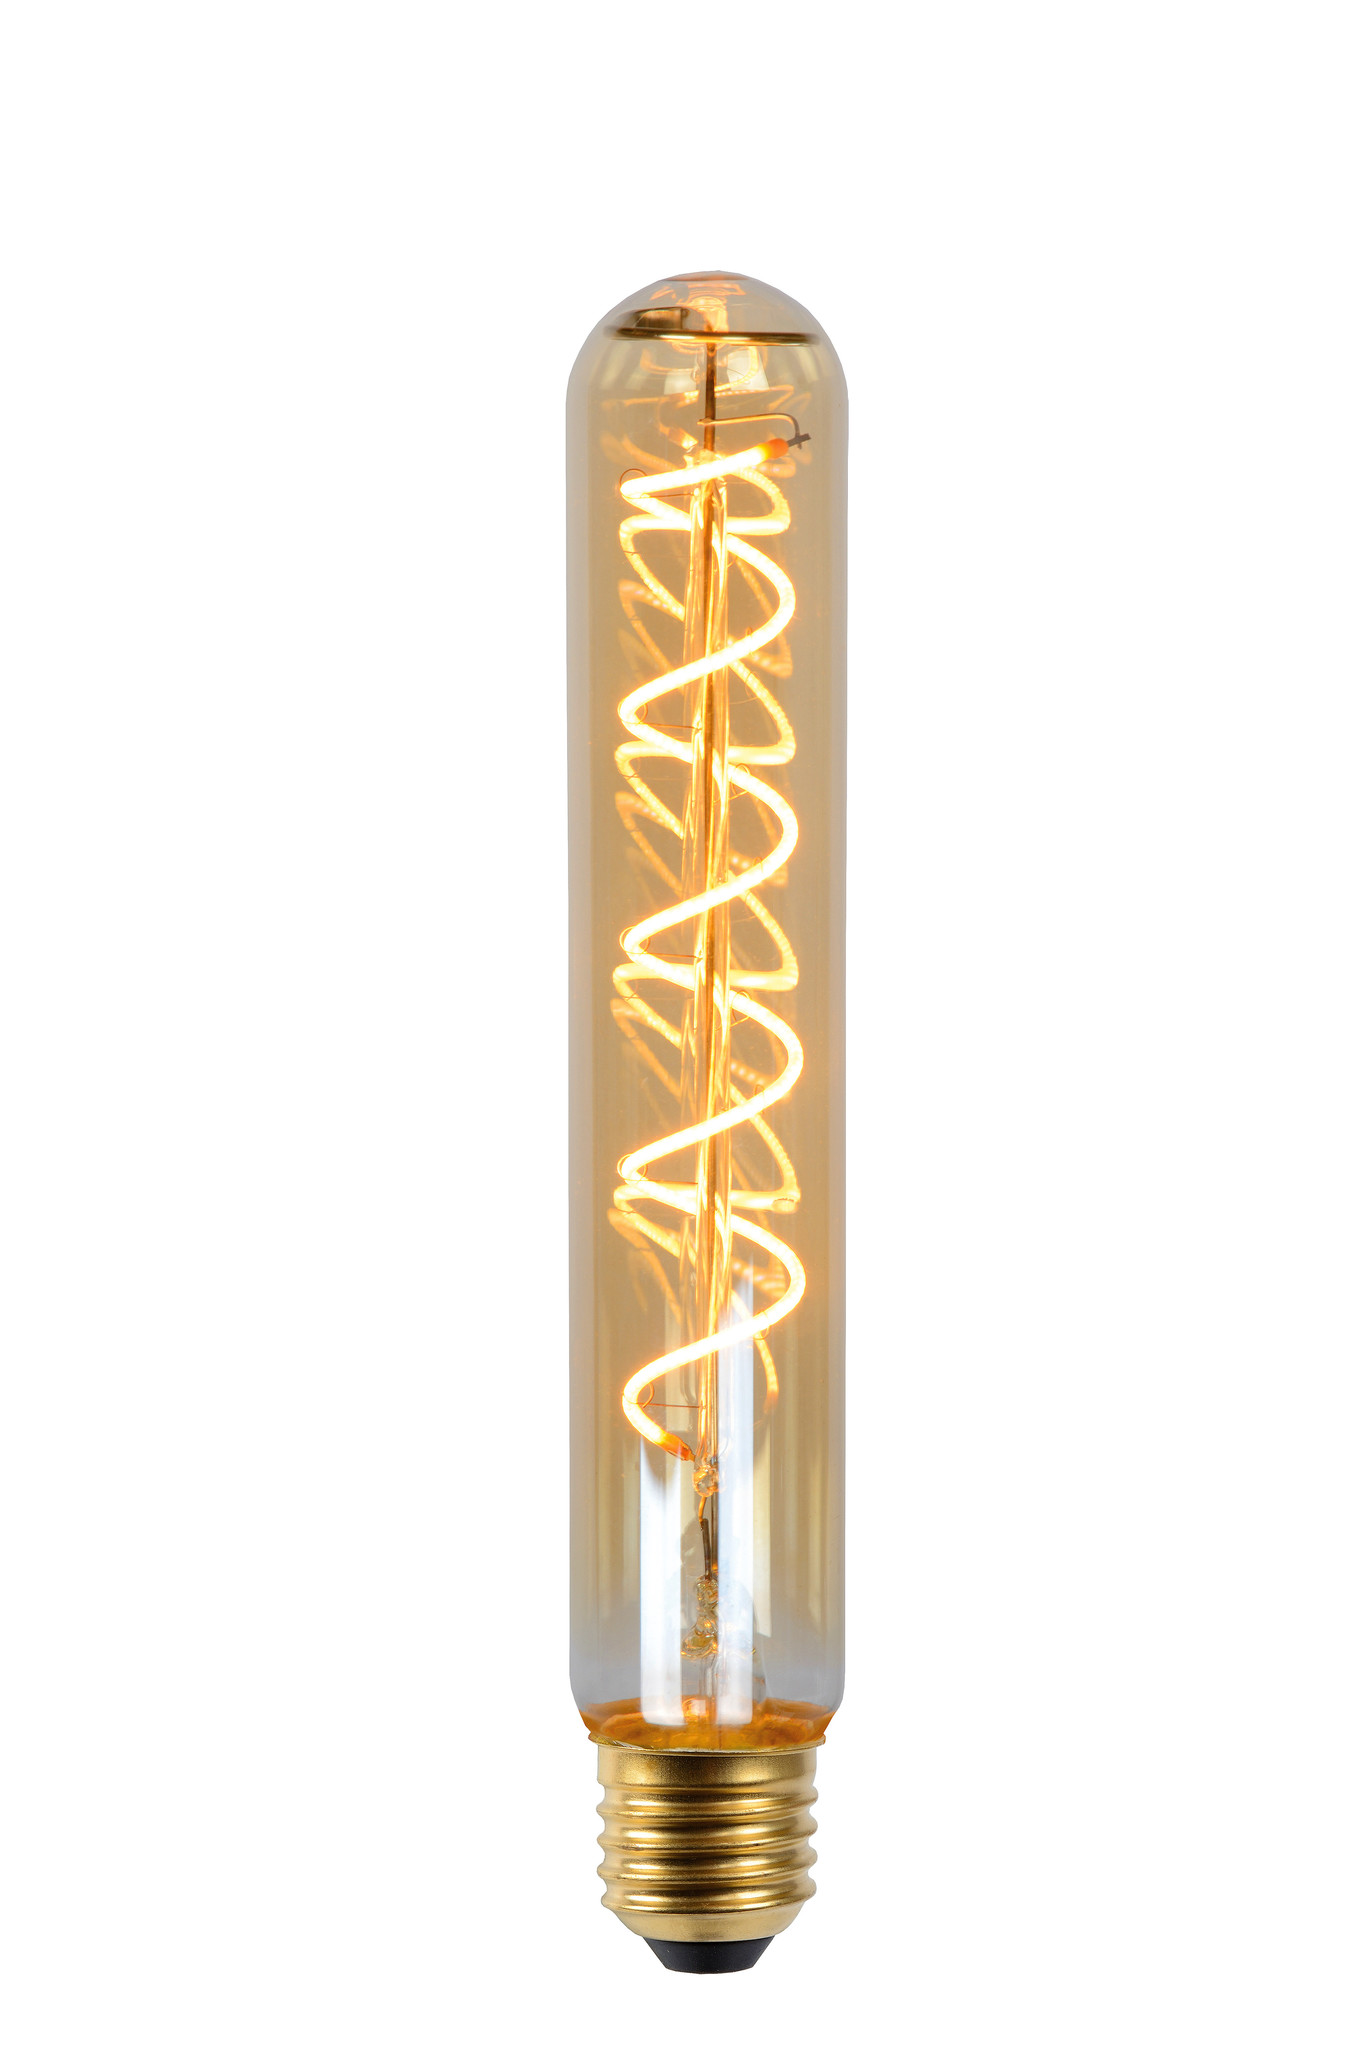 Lucide T32 Fil. lamp-Amber-LED Dimb.-1xE27-5W-2200K